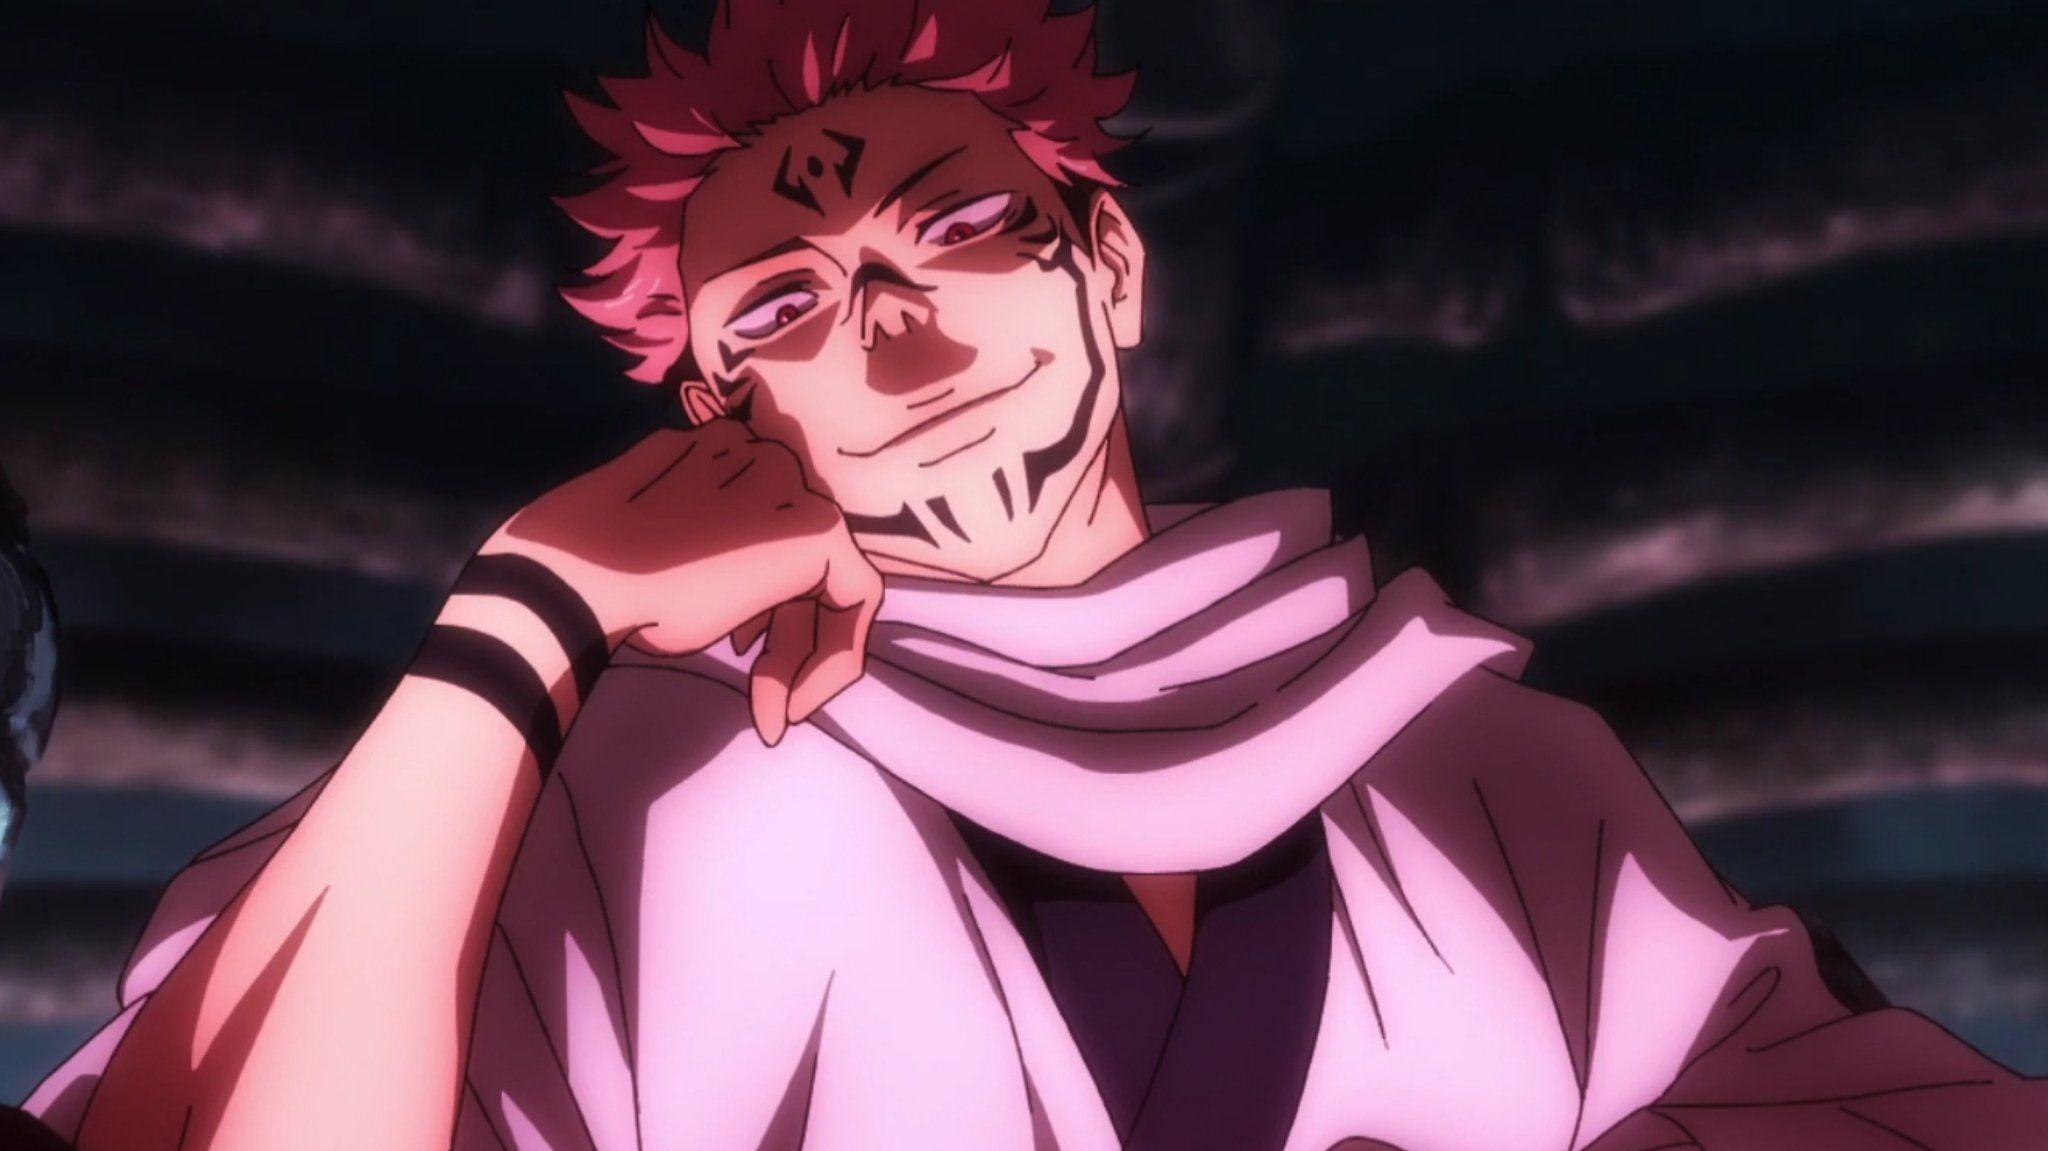 Jujutsu Kaisen On Twitter In 2021 Jujutsu Anime Anime Guys